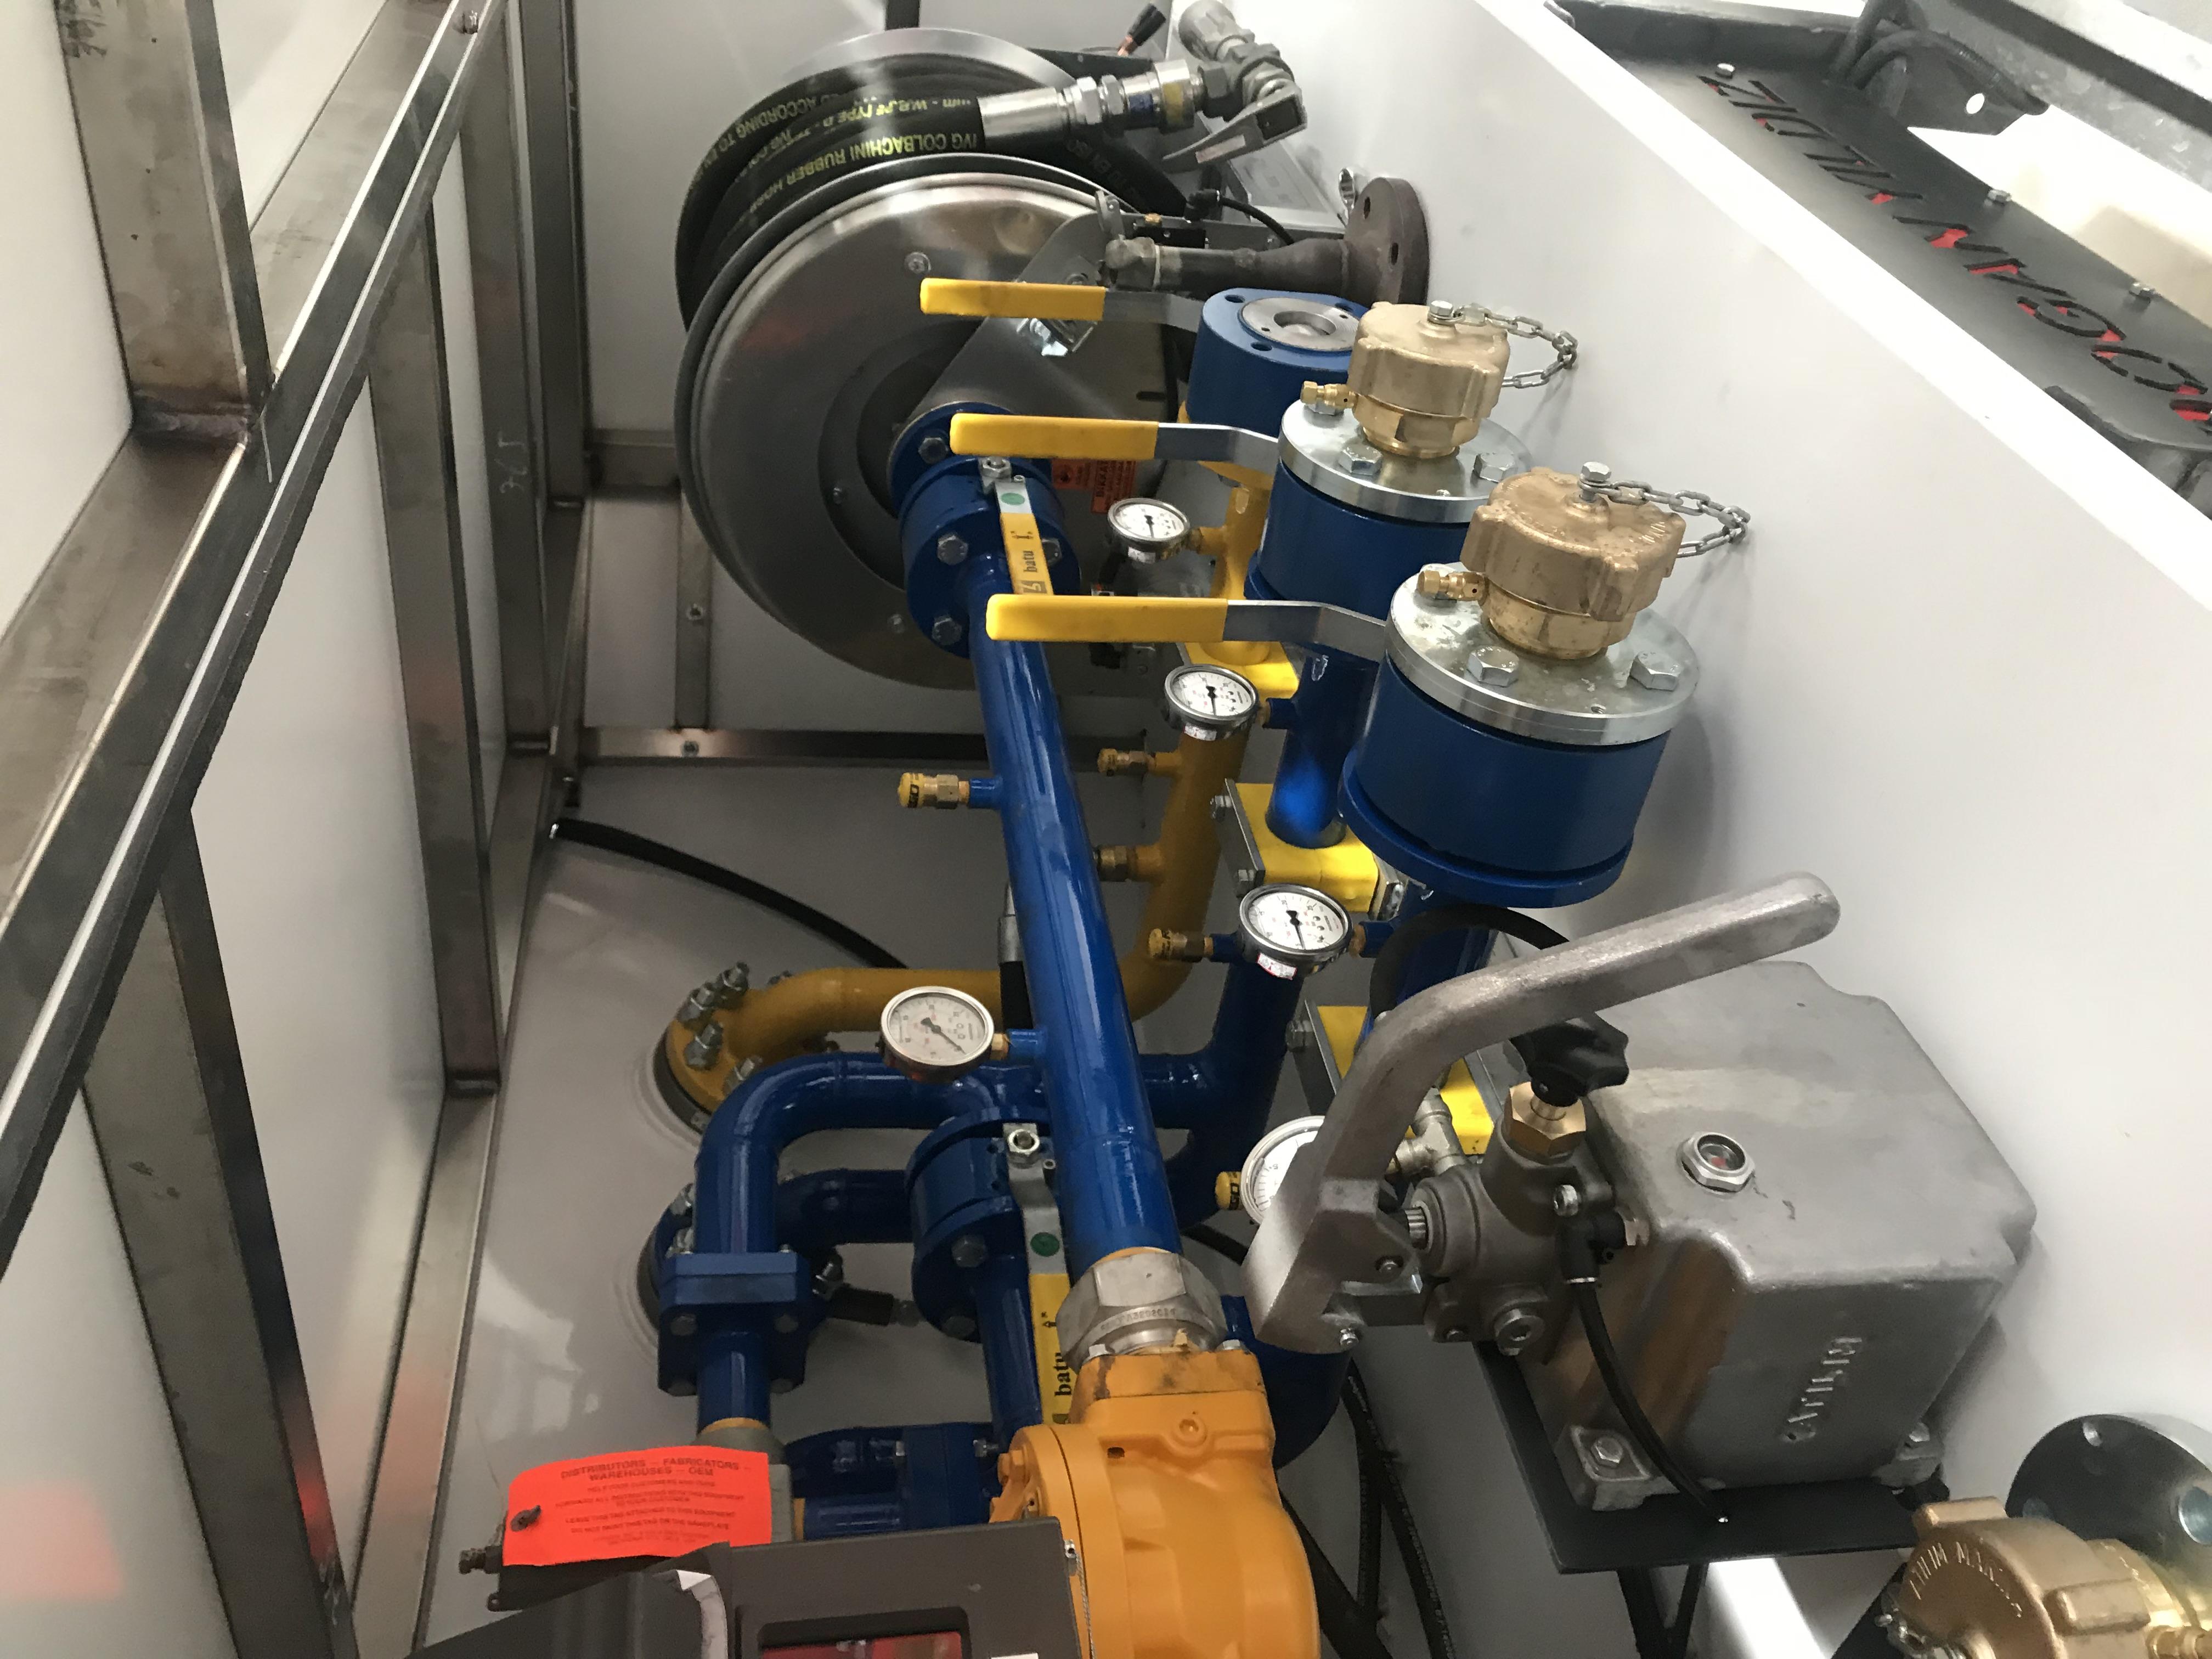 3-axle semi-trailer for transportation of LPG gases